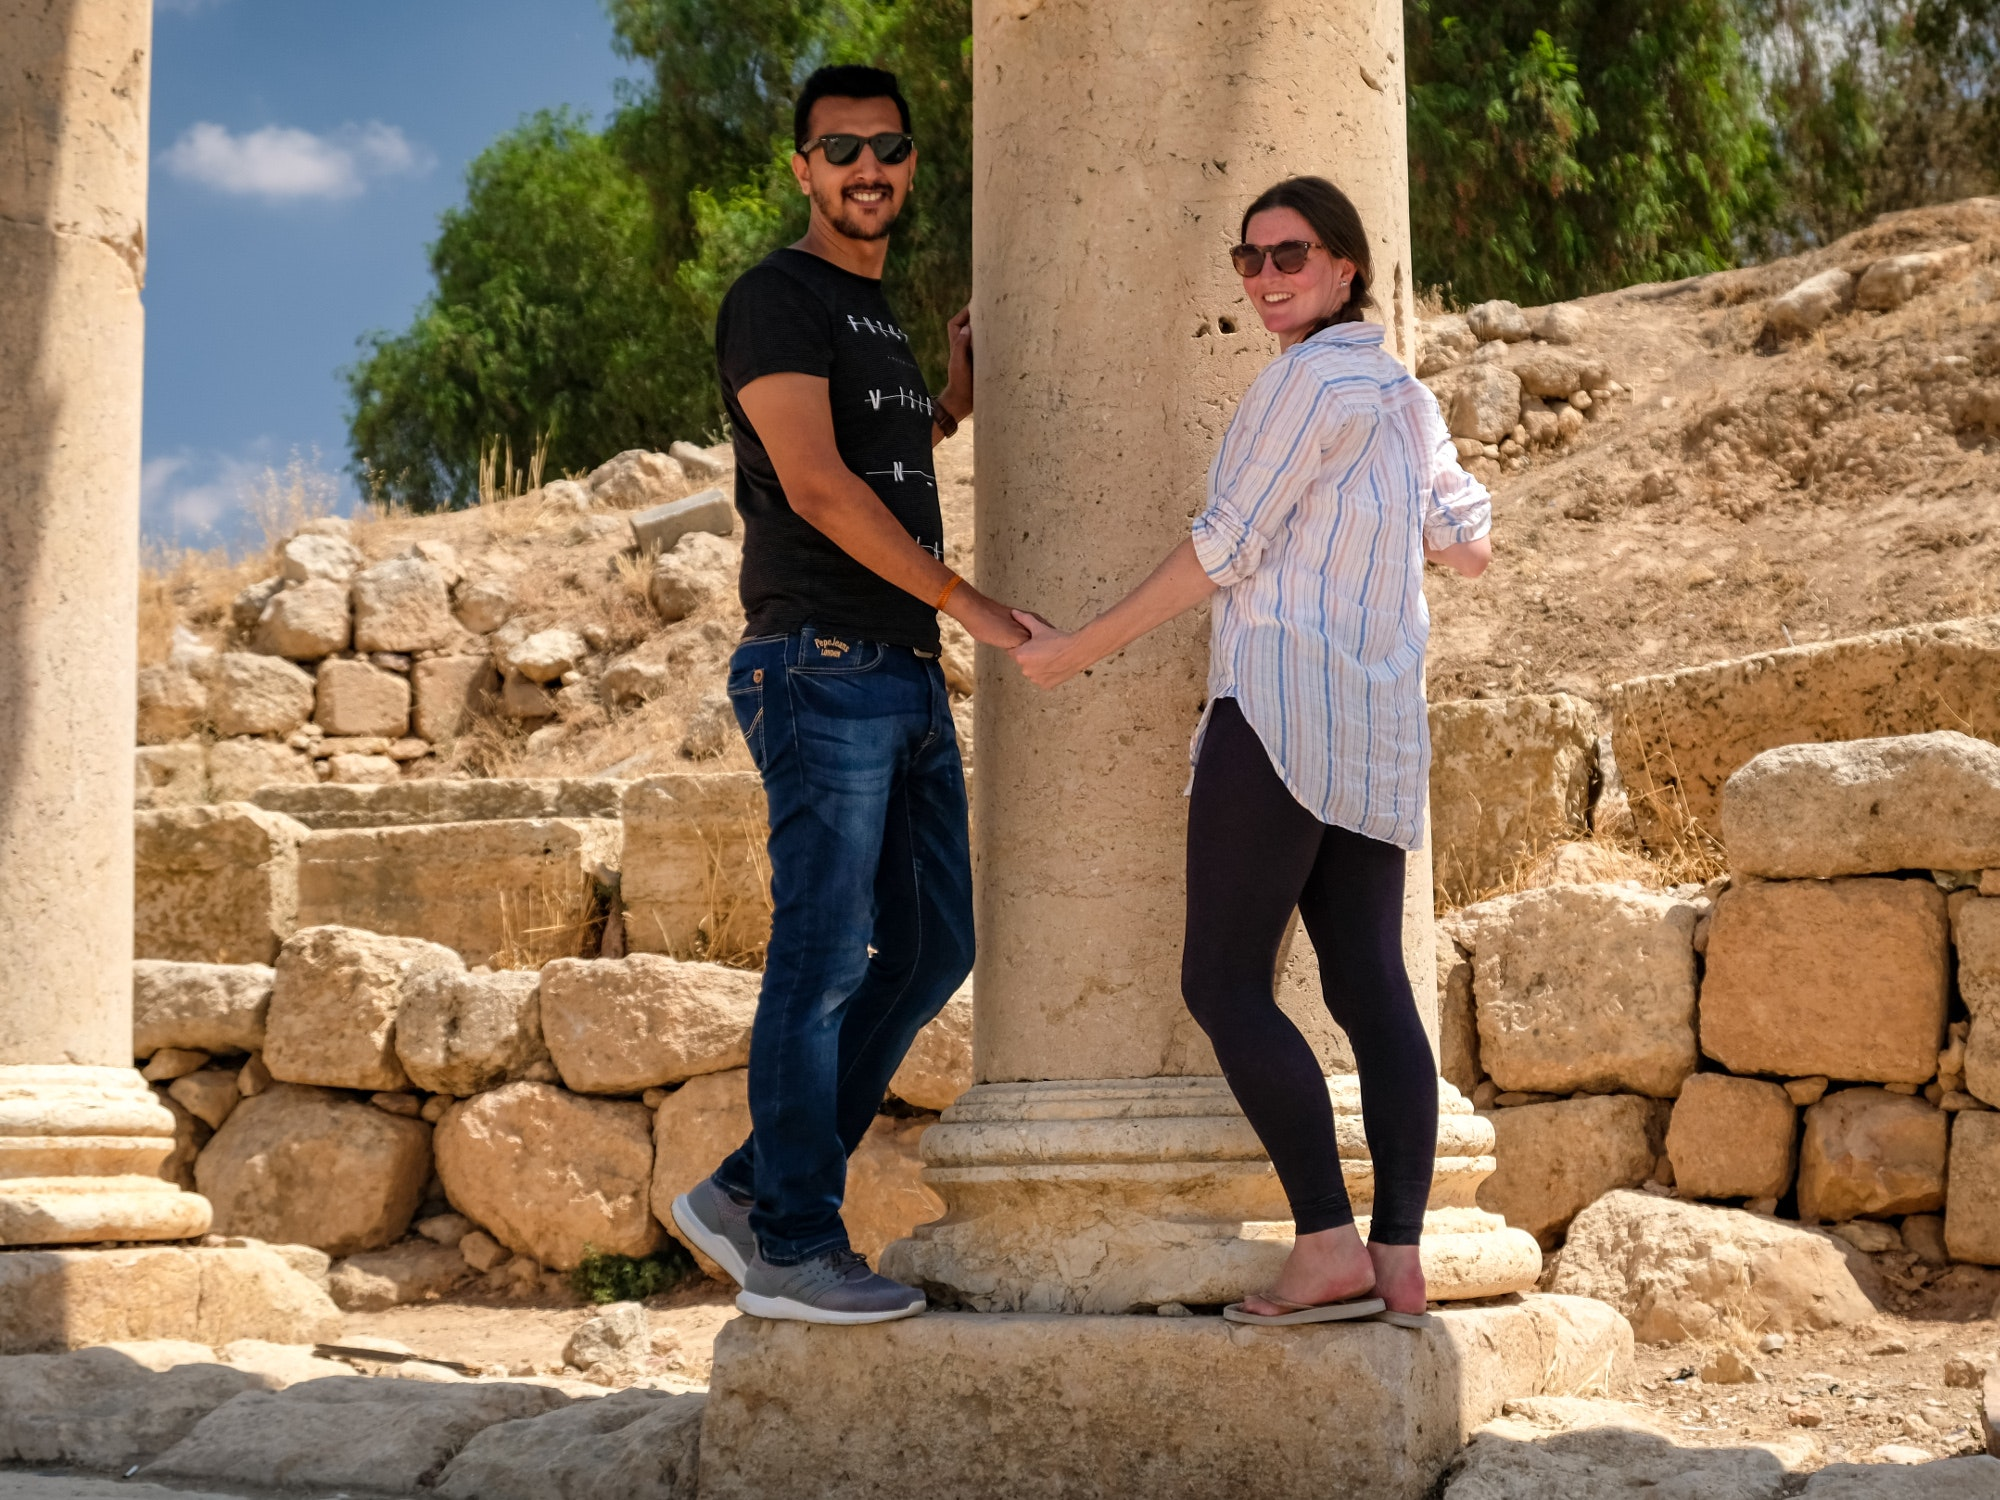 Pathfinder spotlight: Ellie and Ravi, Soul Travel